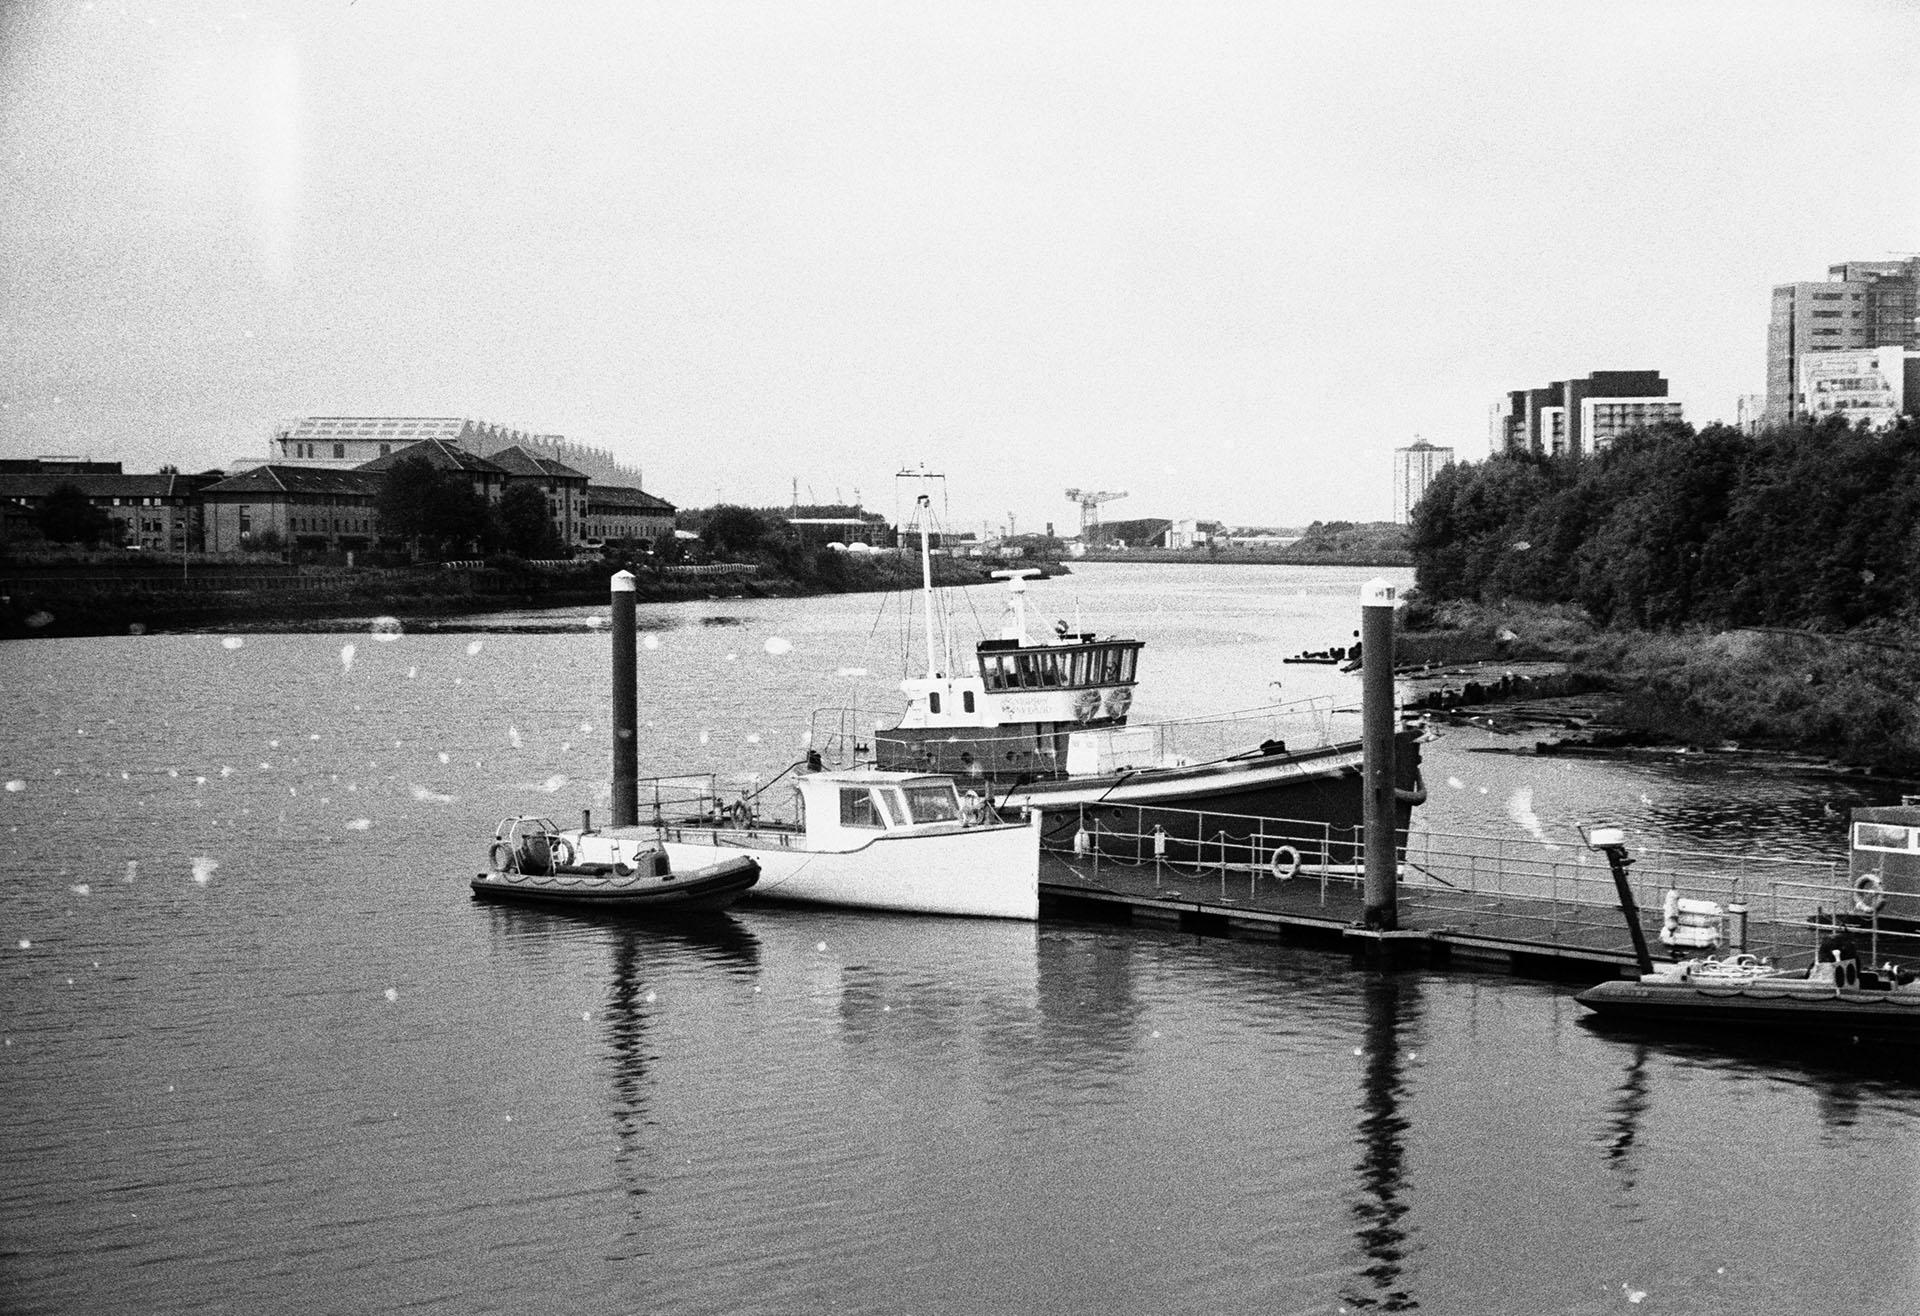 Glasgow Clyde